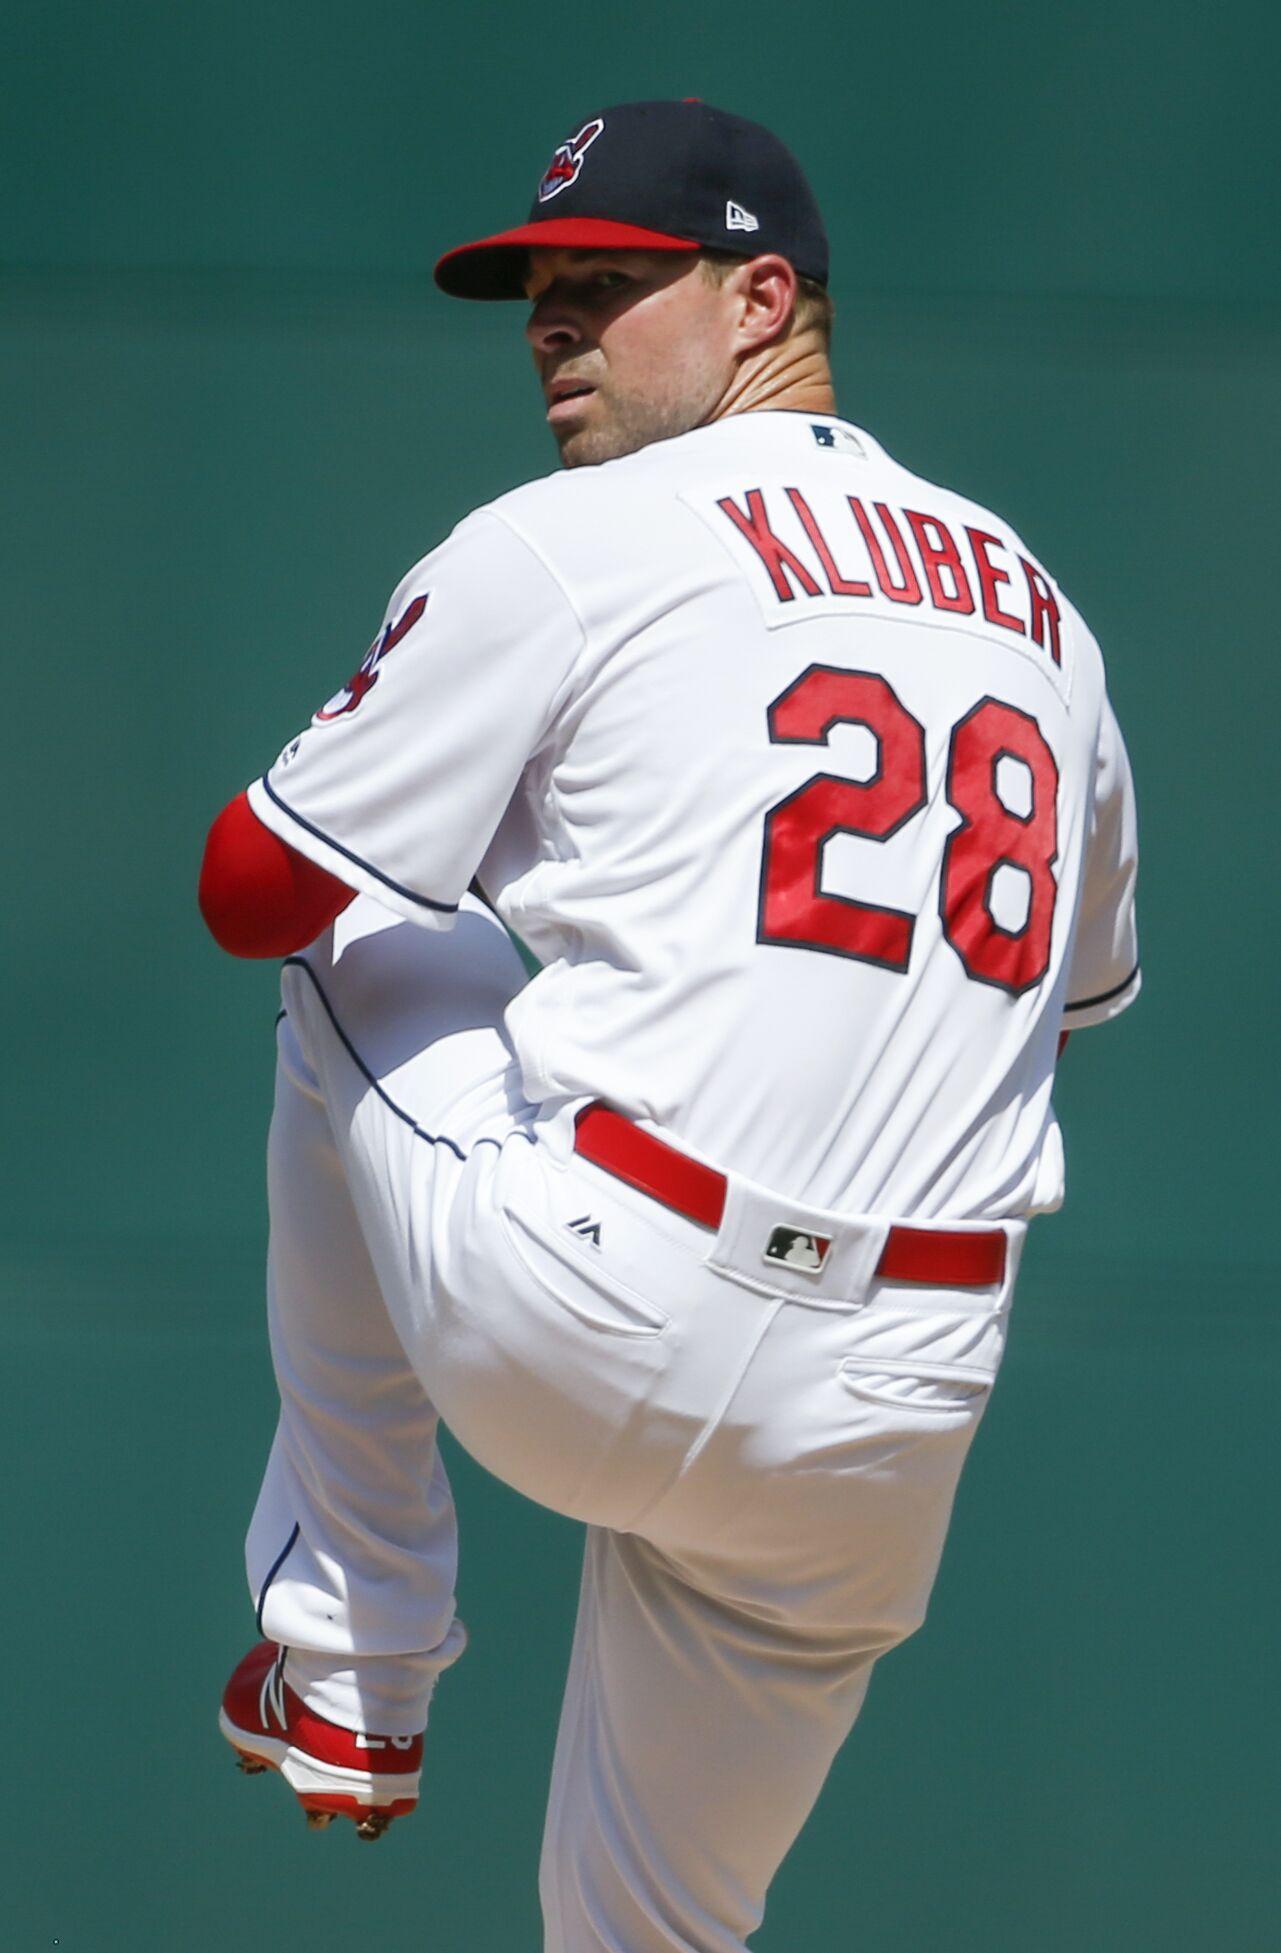 Padres Rumors report team is willing to flip Corey Kluber in 3-Way Trade